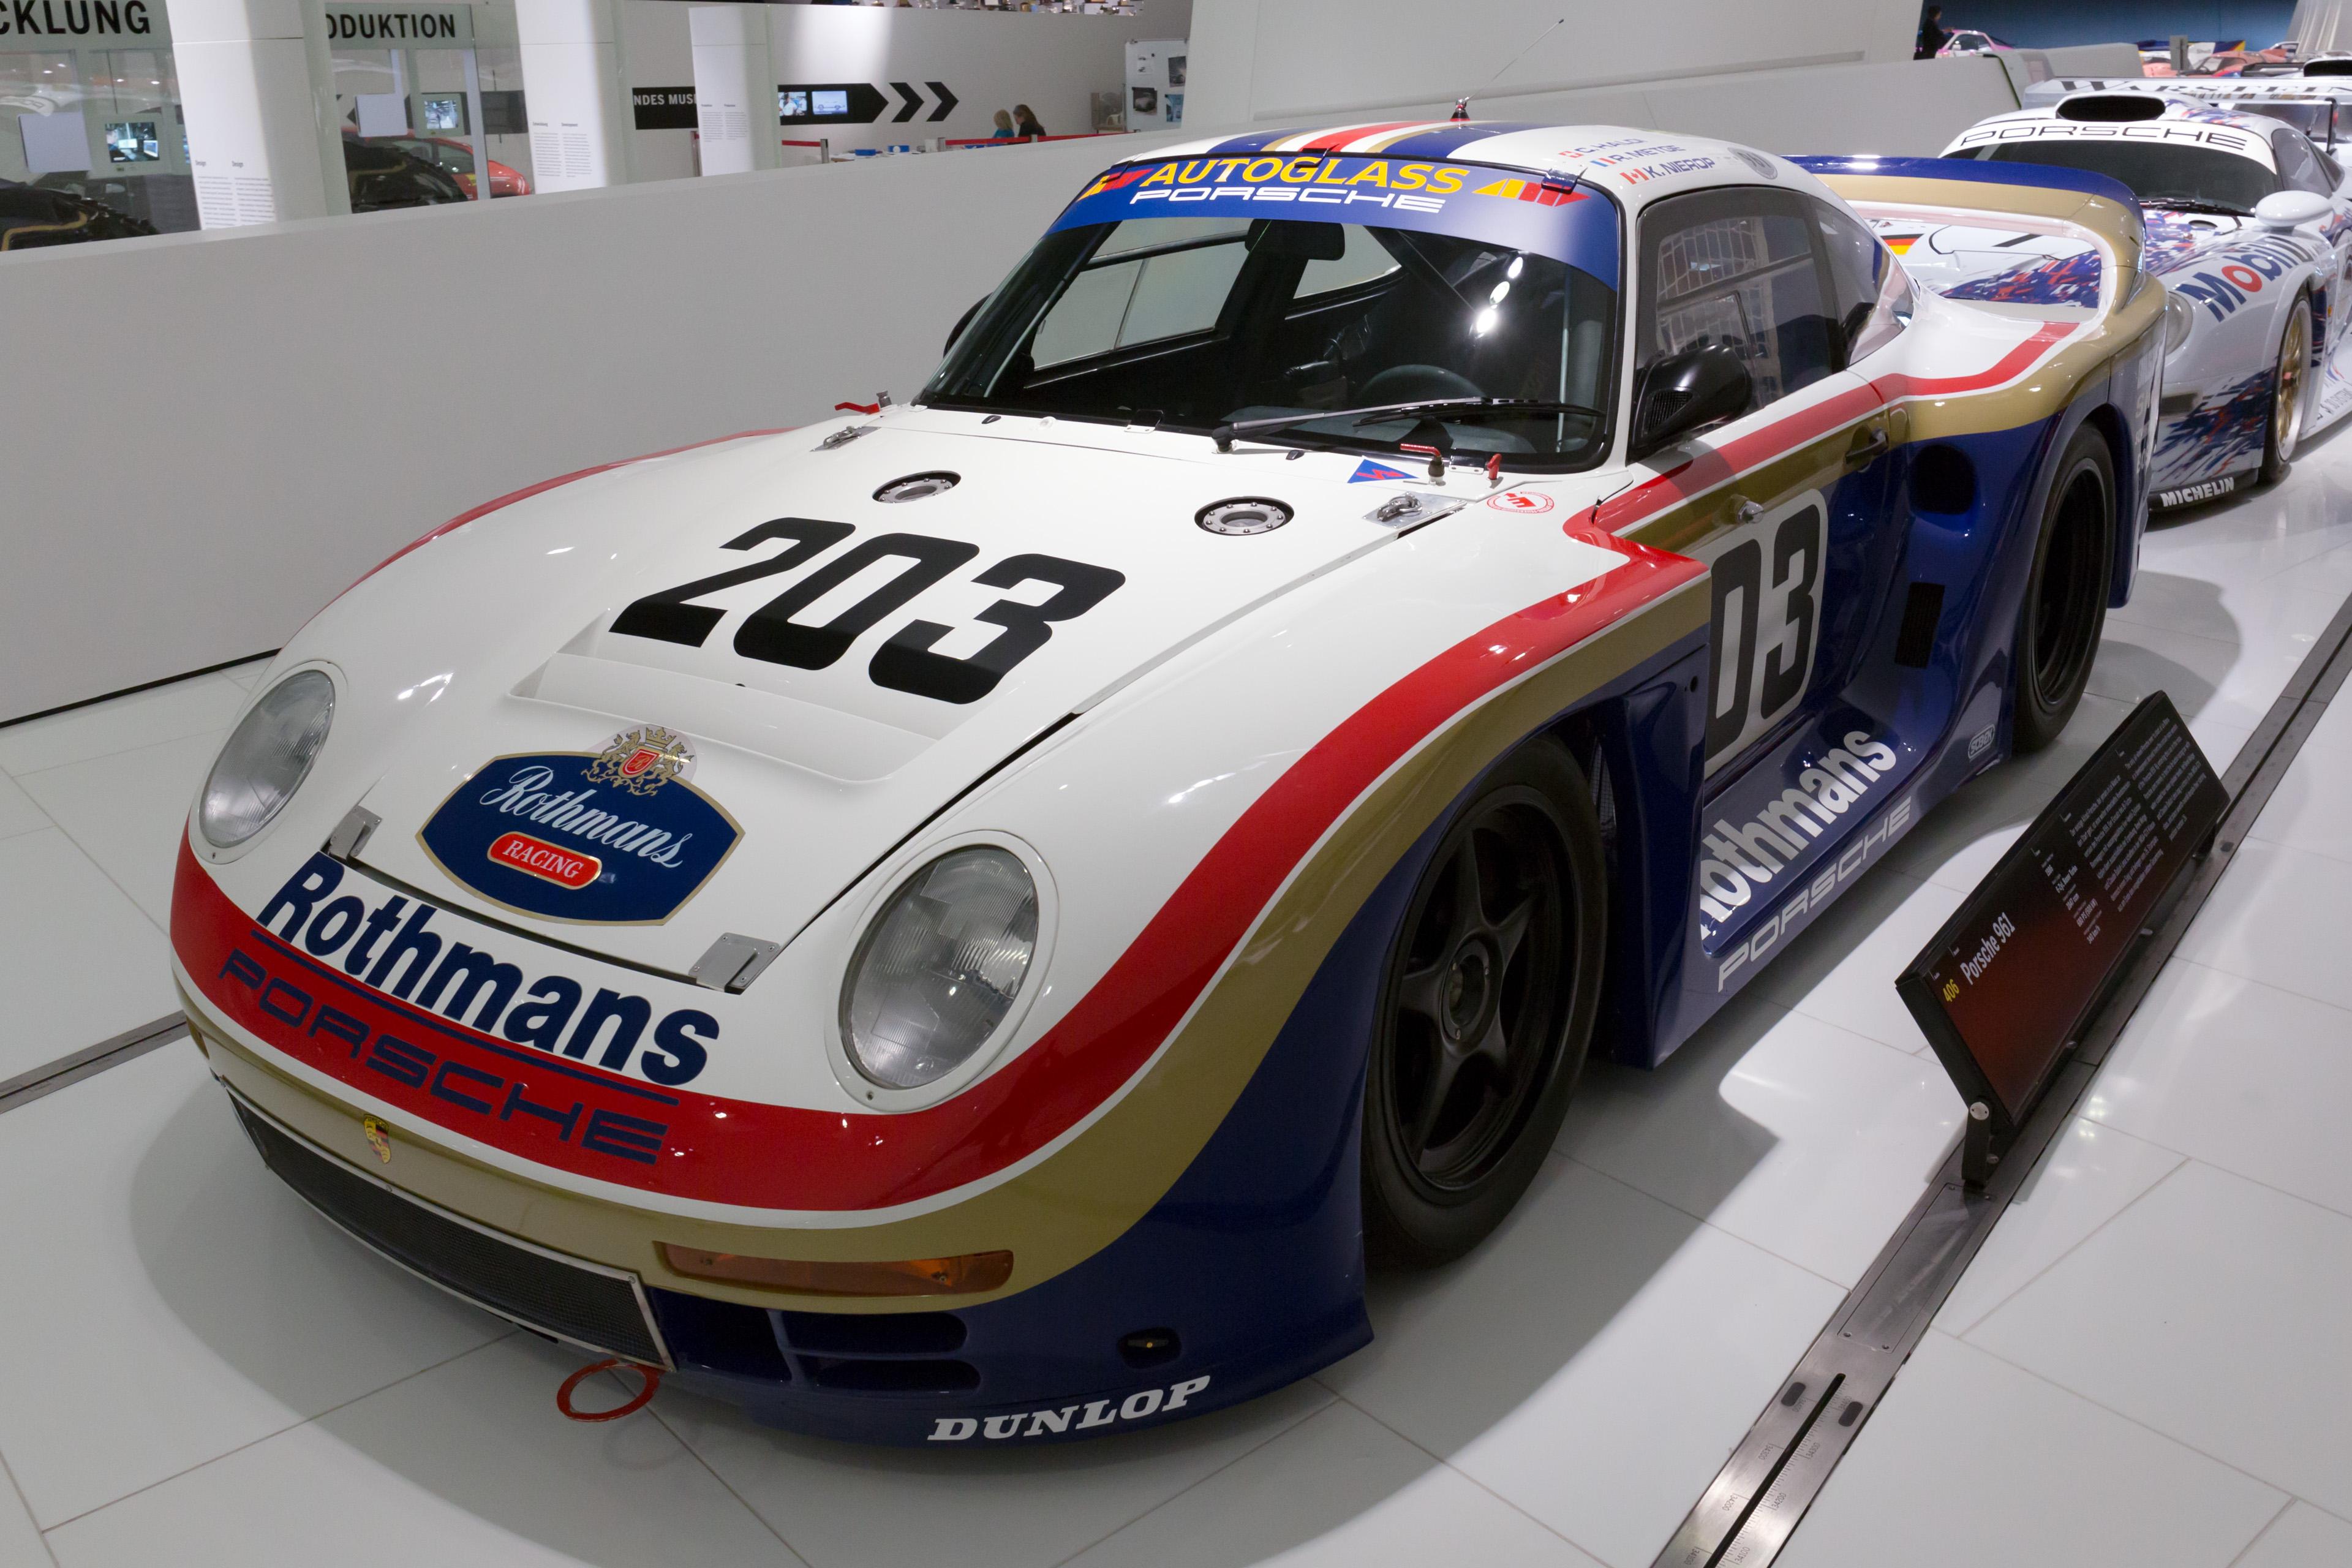 File:Porsche 961 front-left Porsche Museum.jpg